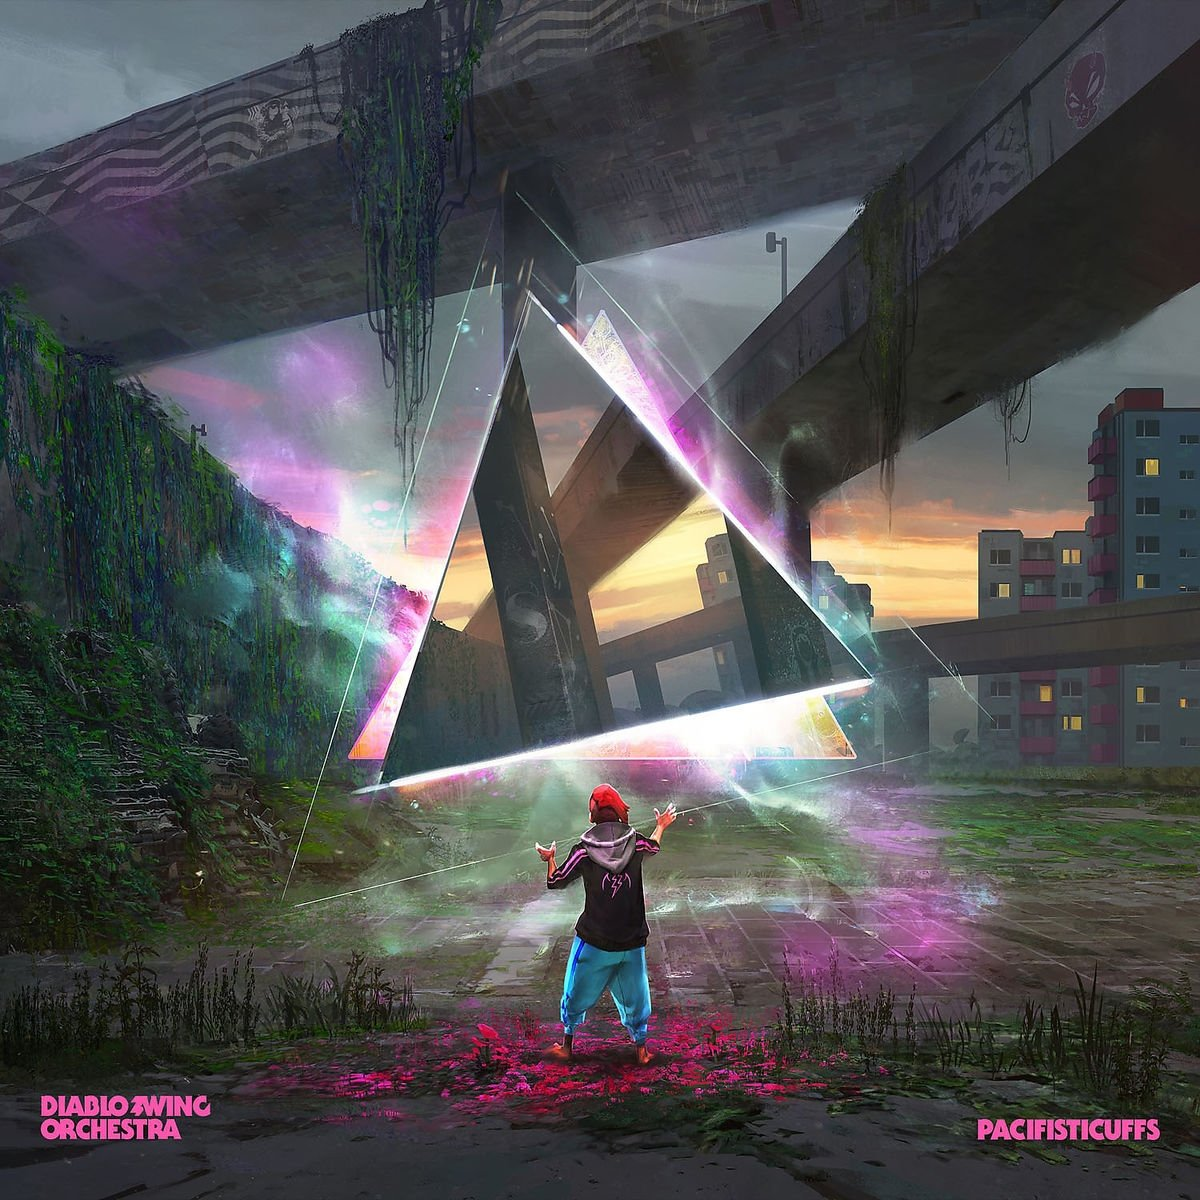 CD : Diablo Swing Orchestra - Pacifisticuffs (CD)